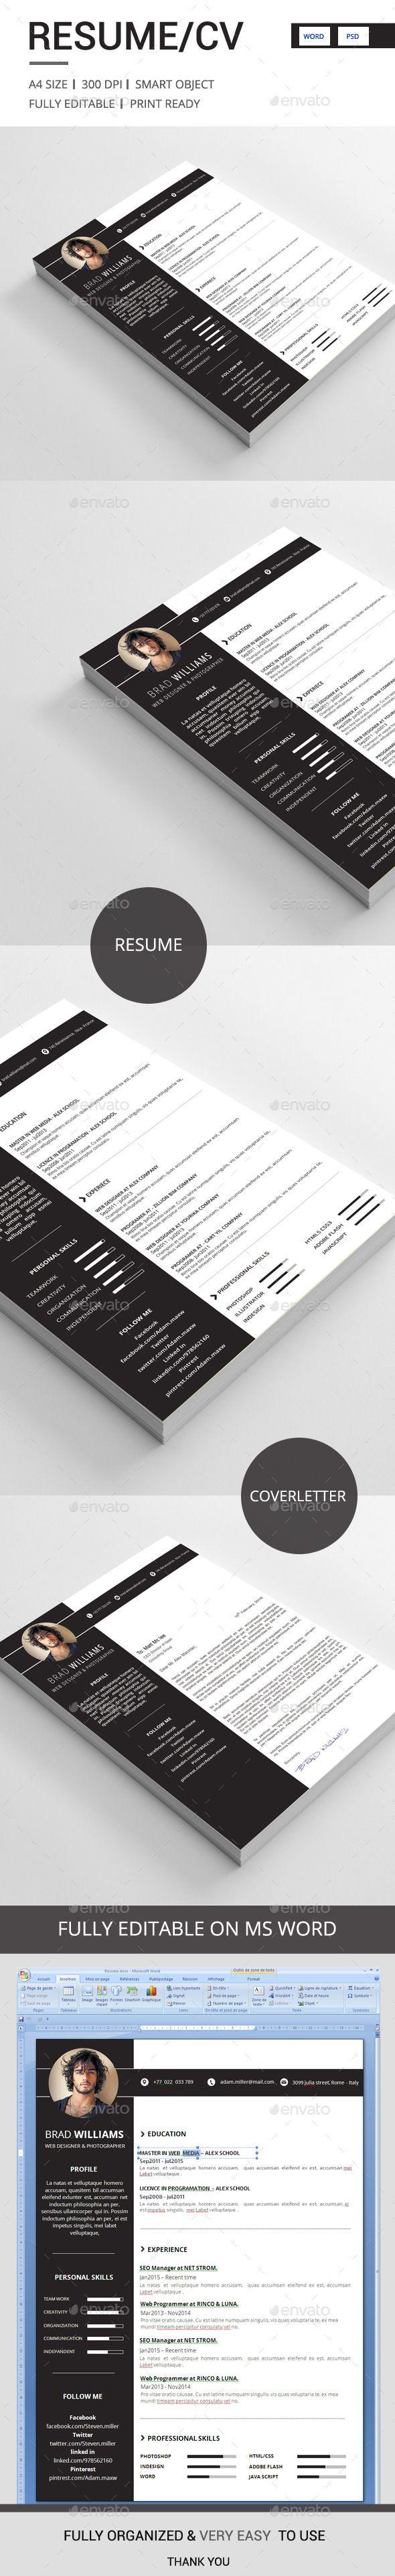 Cv 101 best CREATIVE CV images on